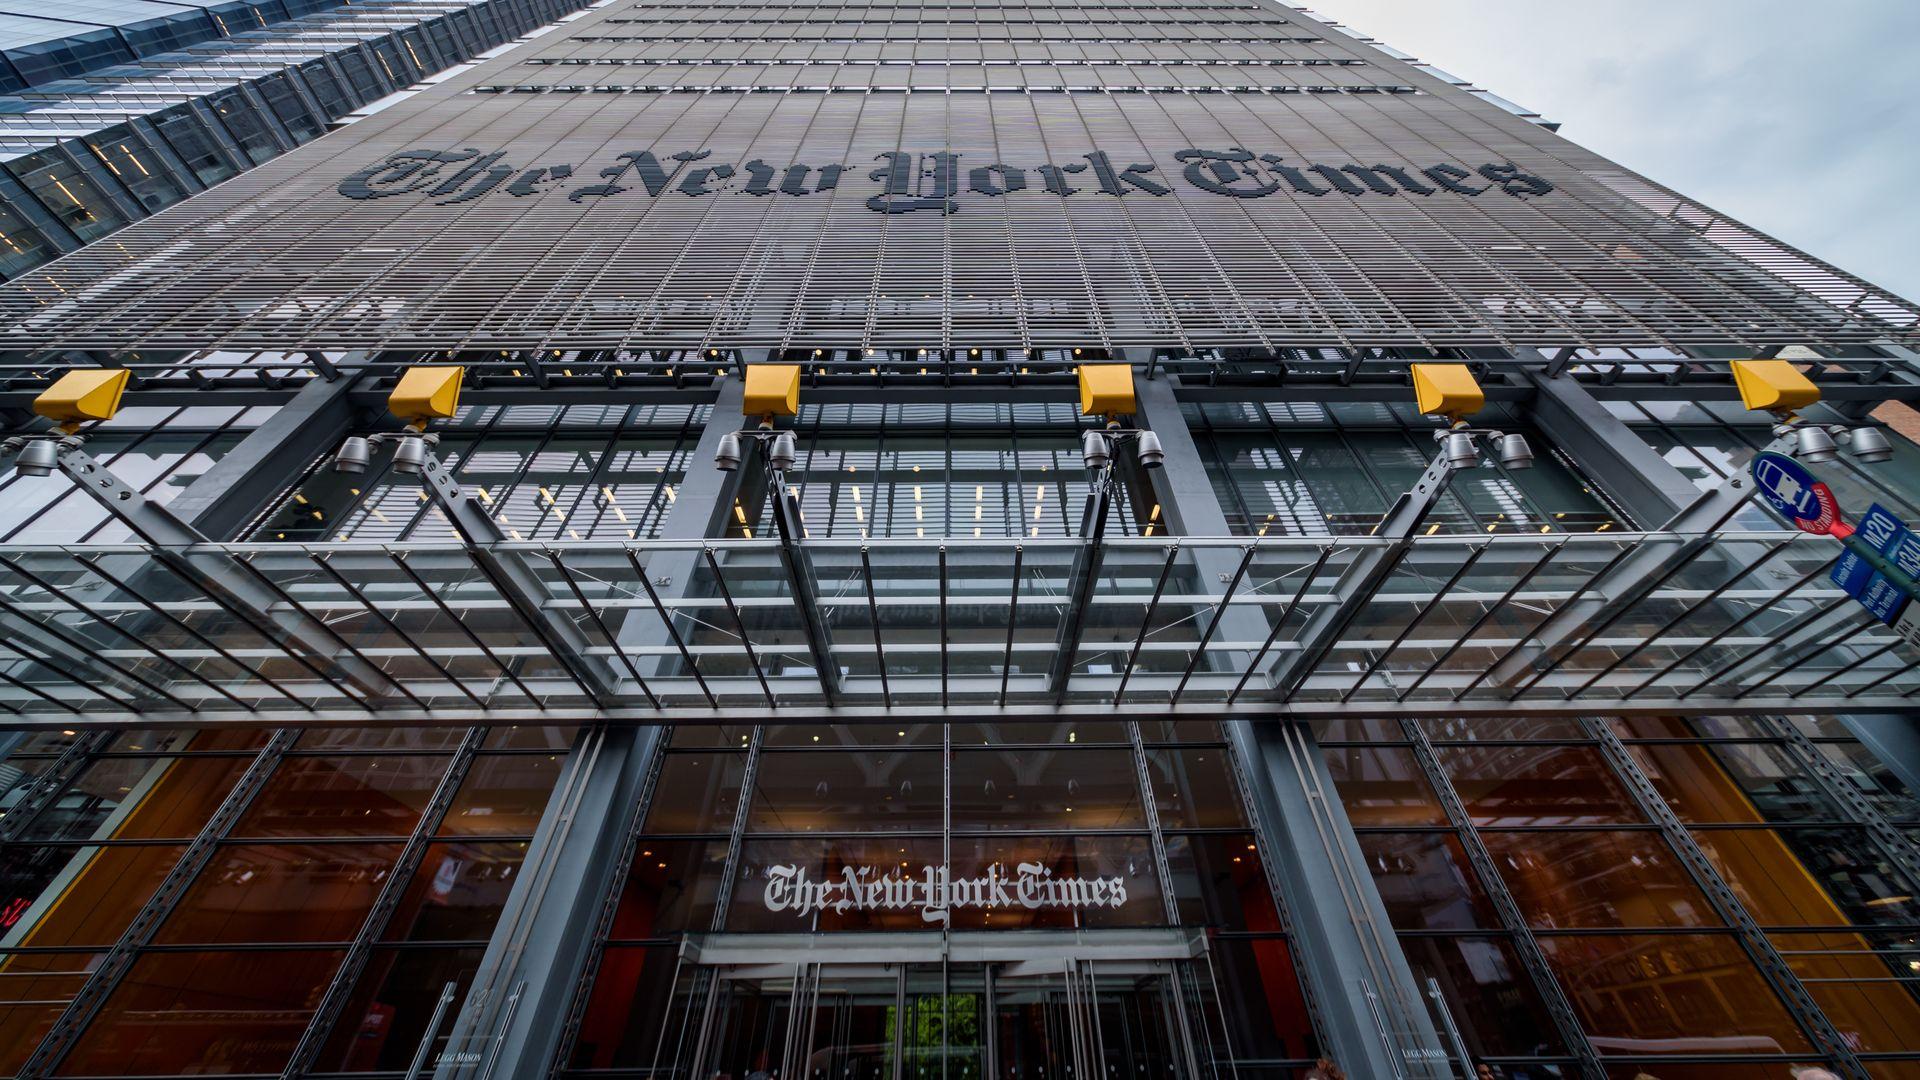 New York Times endorses Elizabeth Warren and Amy Klobuchar for president